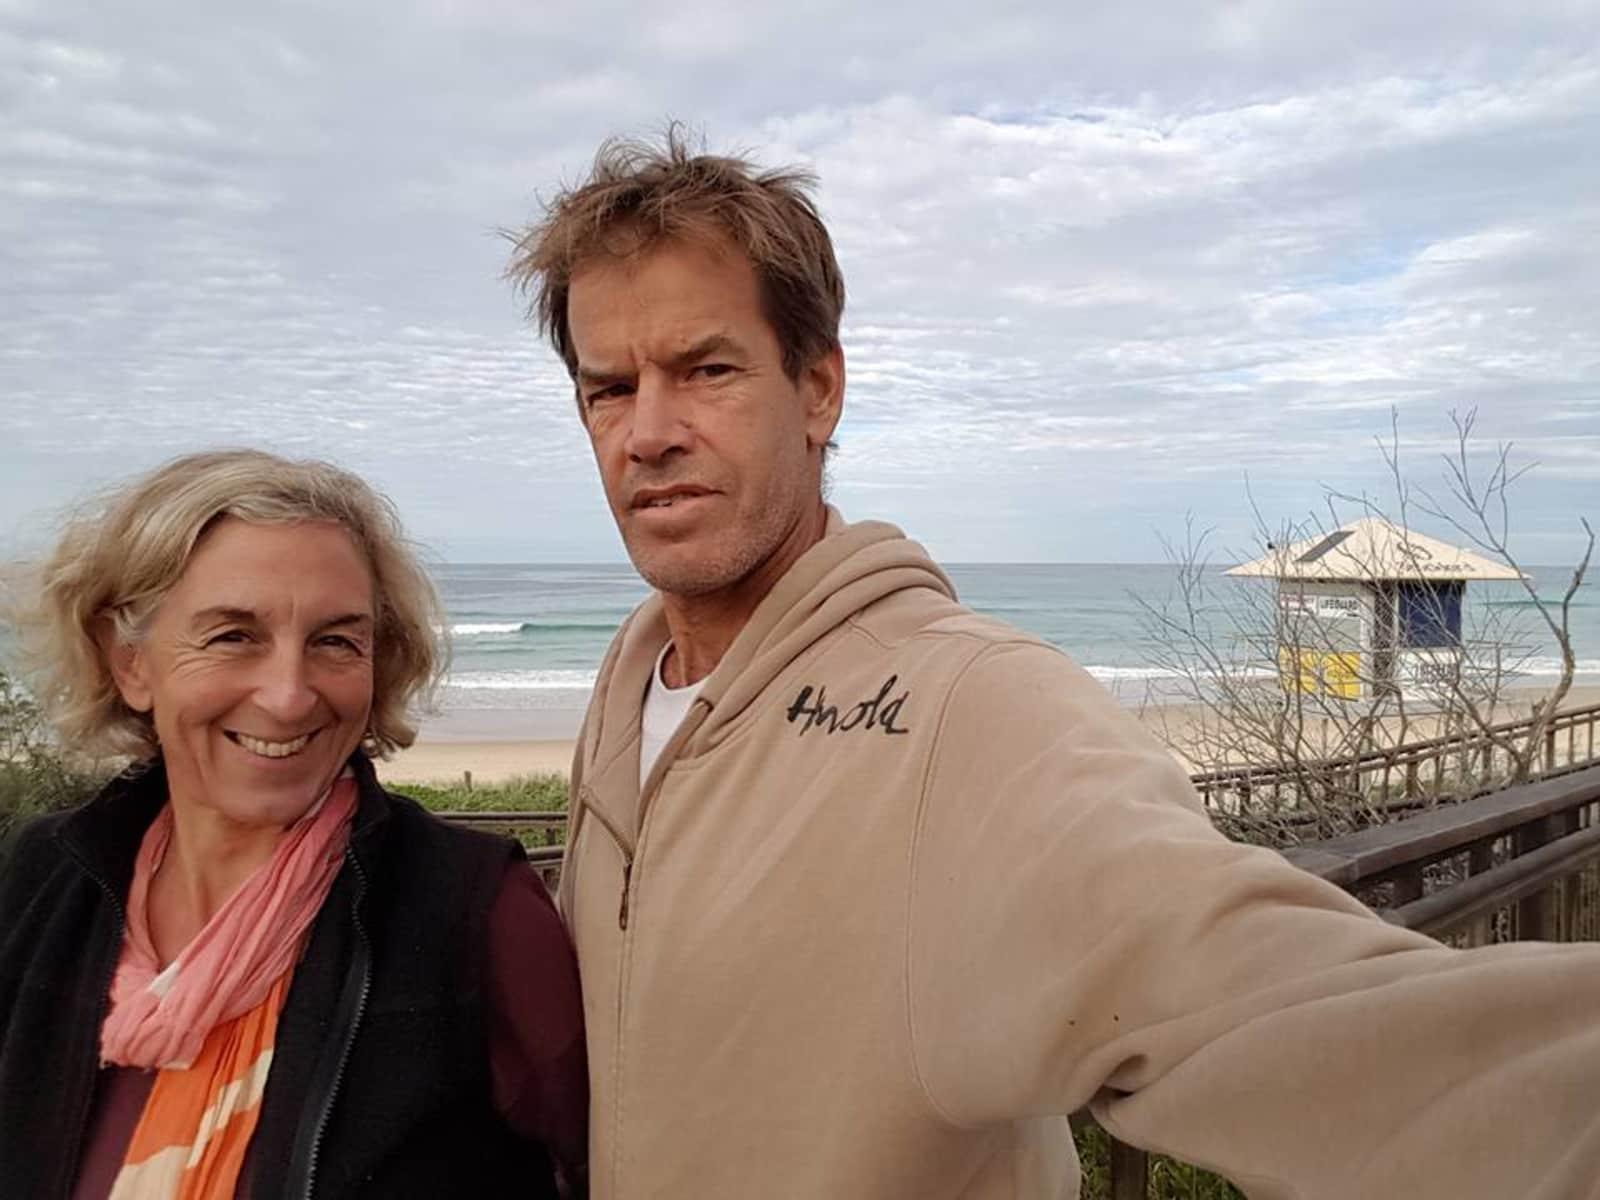 Catherine & Phil from Coolum Beach, Queensland, Australia